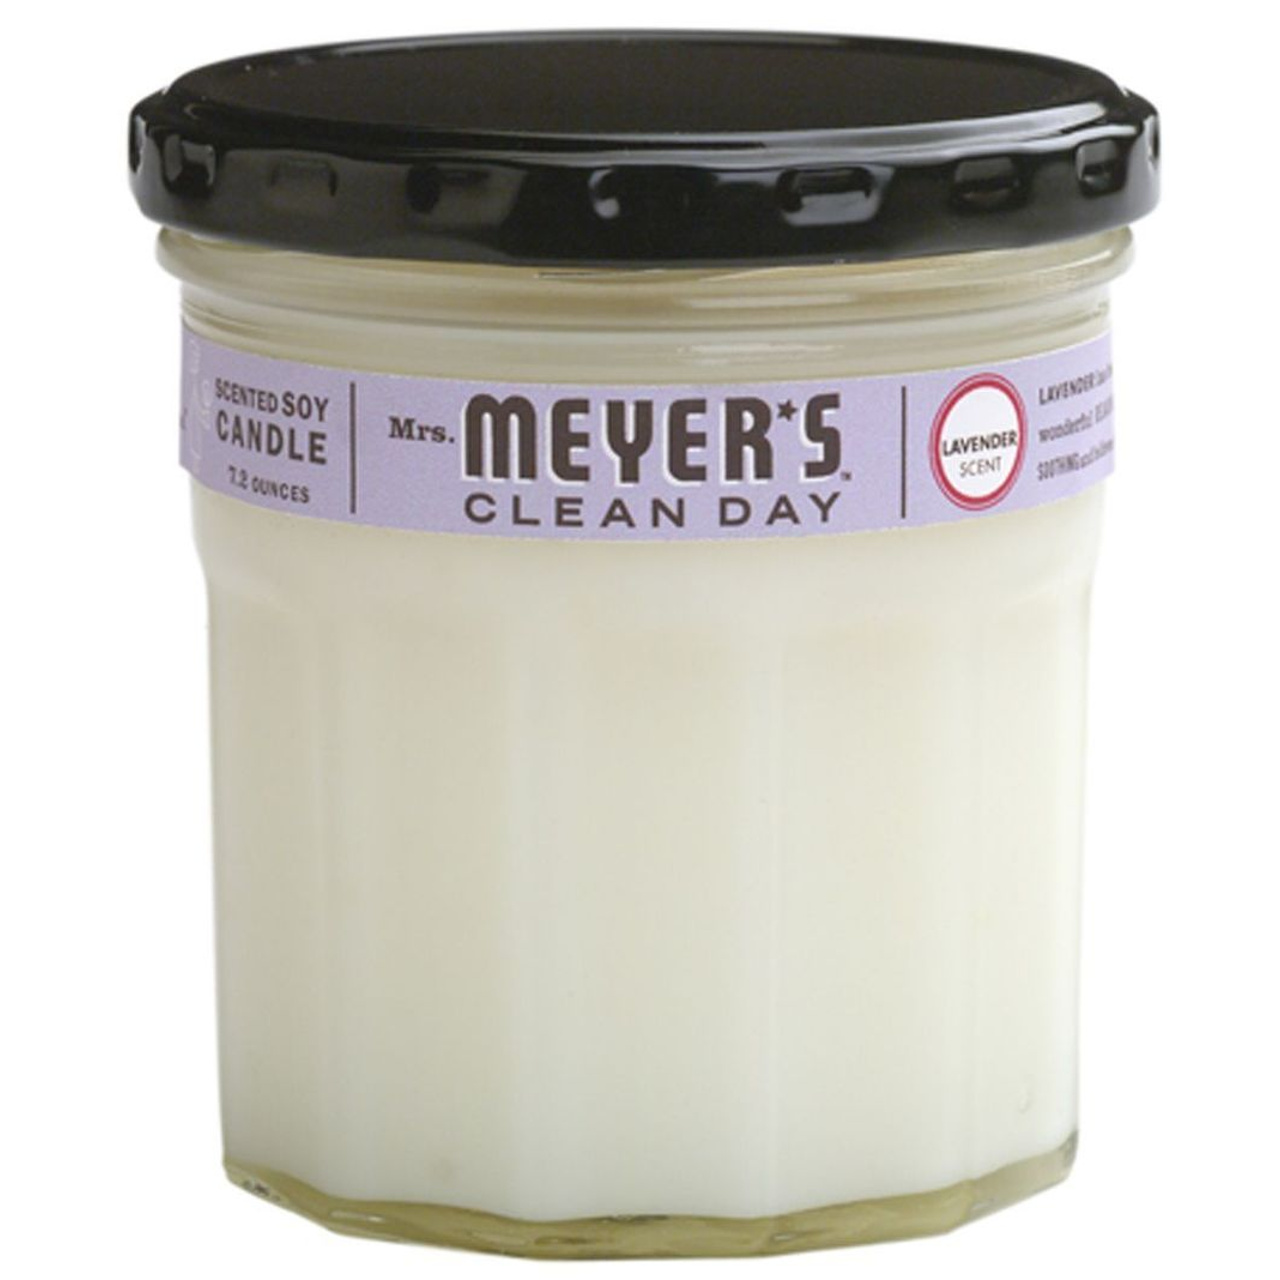 Caldrea 7.2 oz Lavander Clean Day Soy Candle